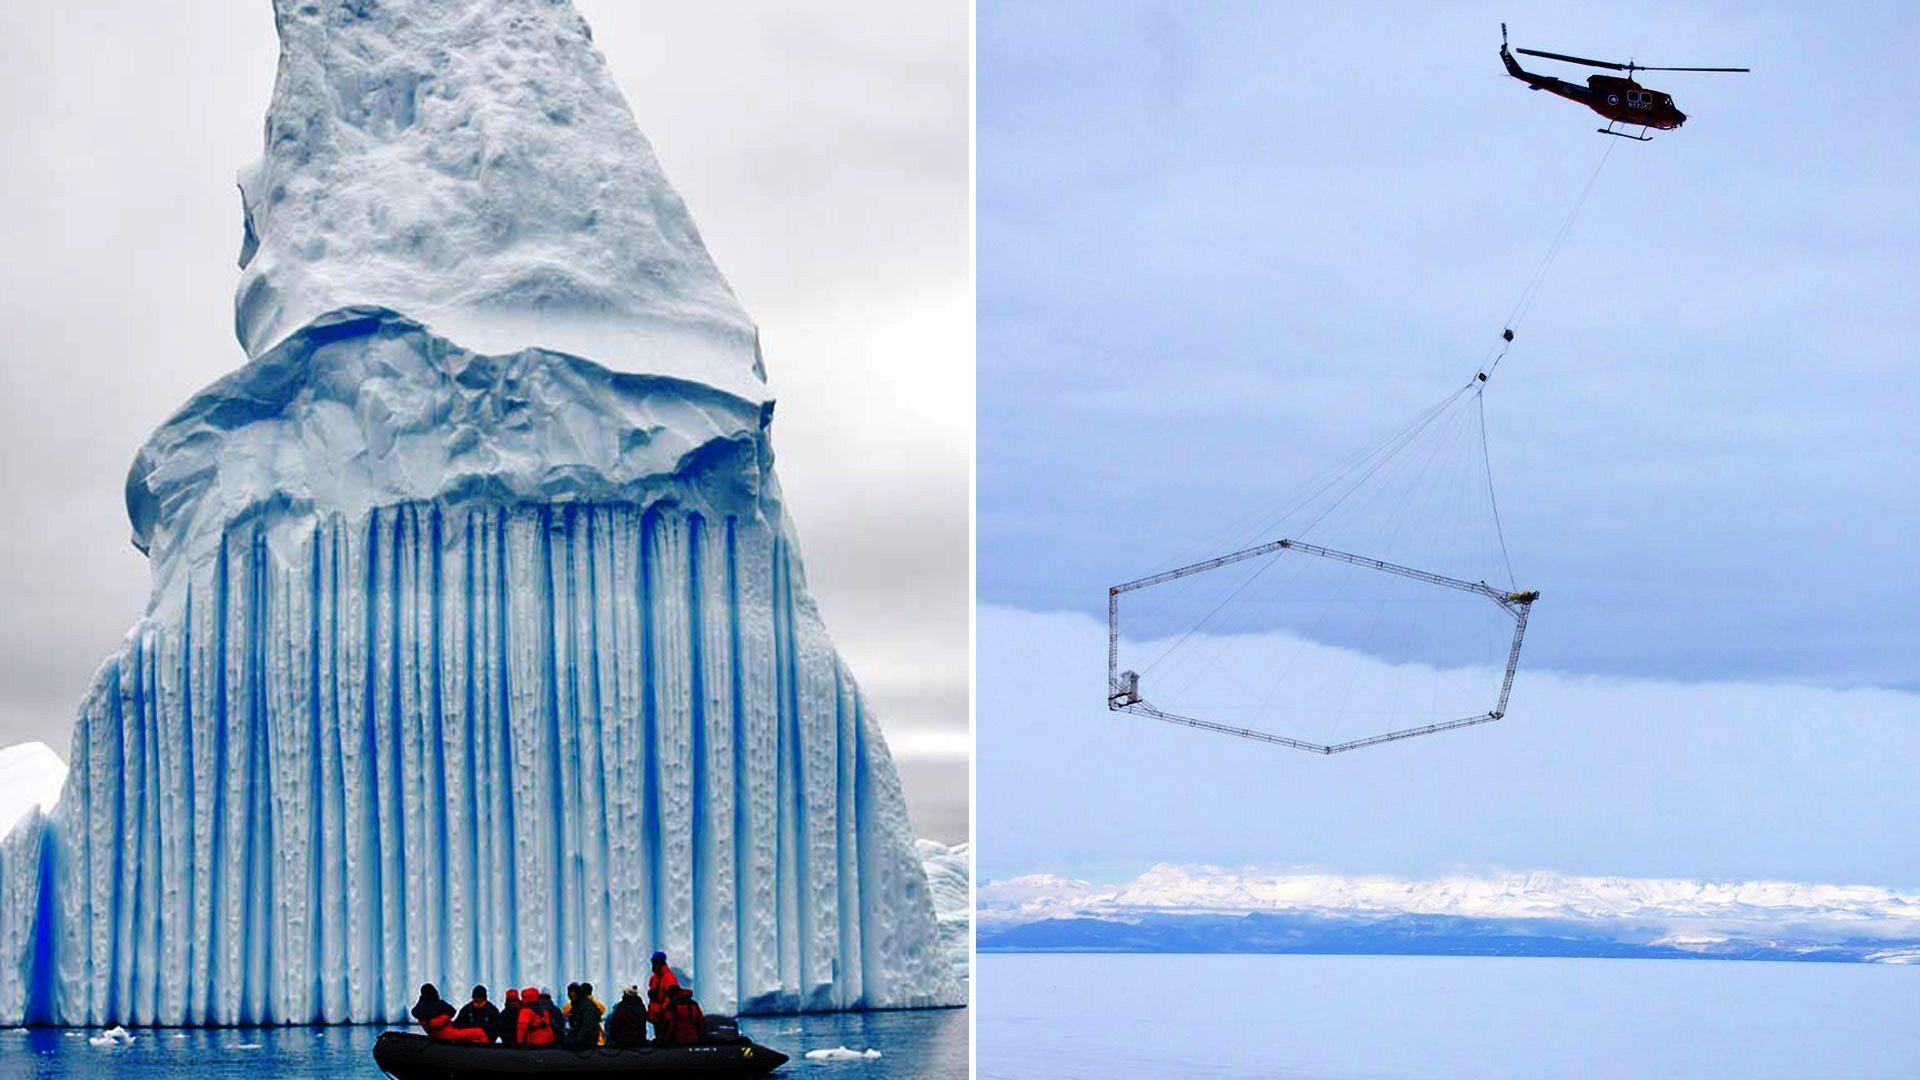 Frozen waves antarctica tourism pinterest tourism for Can anyone visit antarctica